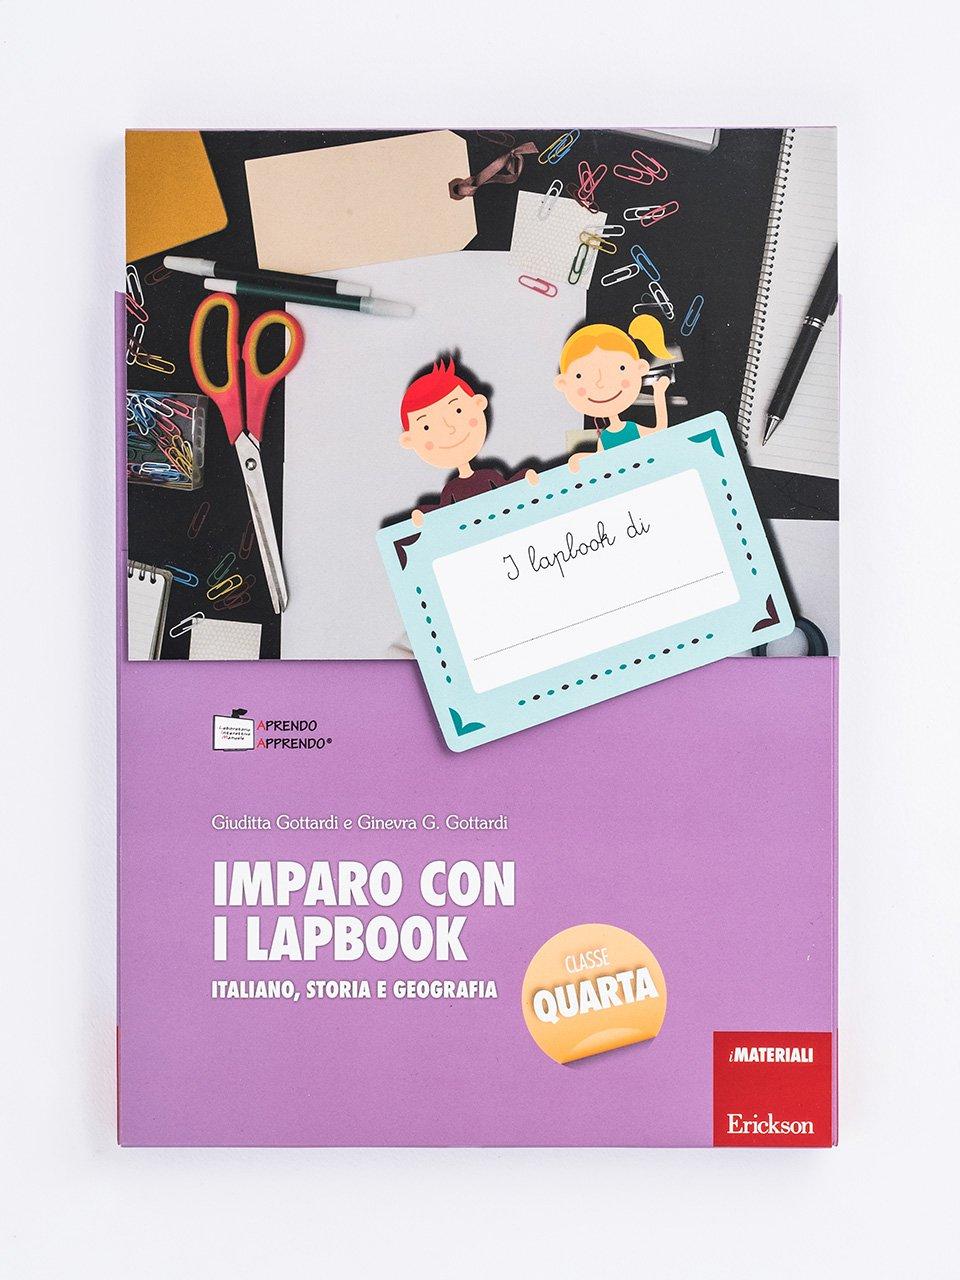 Imparo con i lapbook - Italiano, storia e geografia - Classe quarta - Ginevra G. Gottardi - Erickson